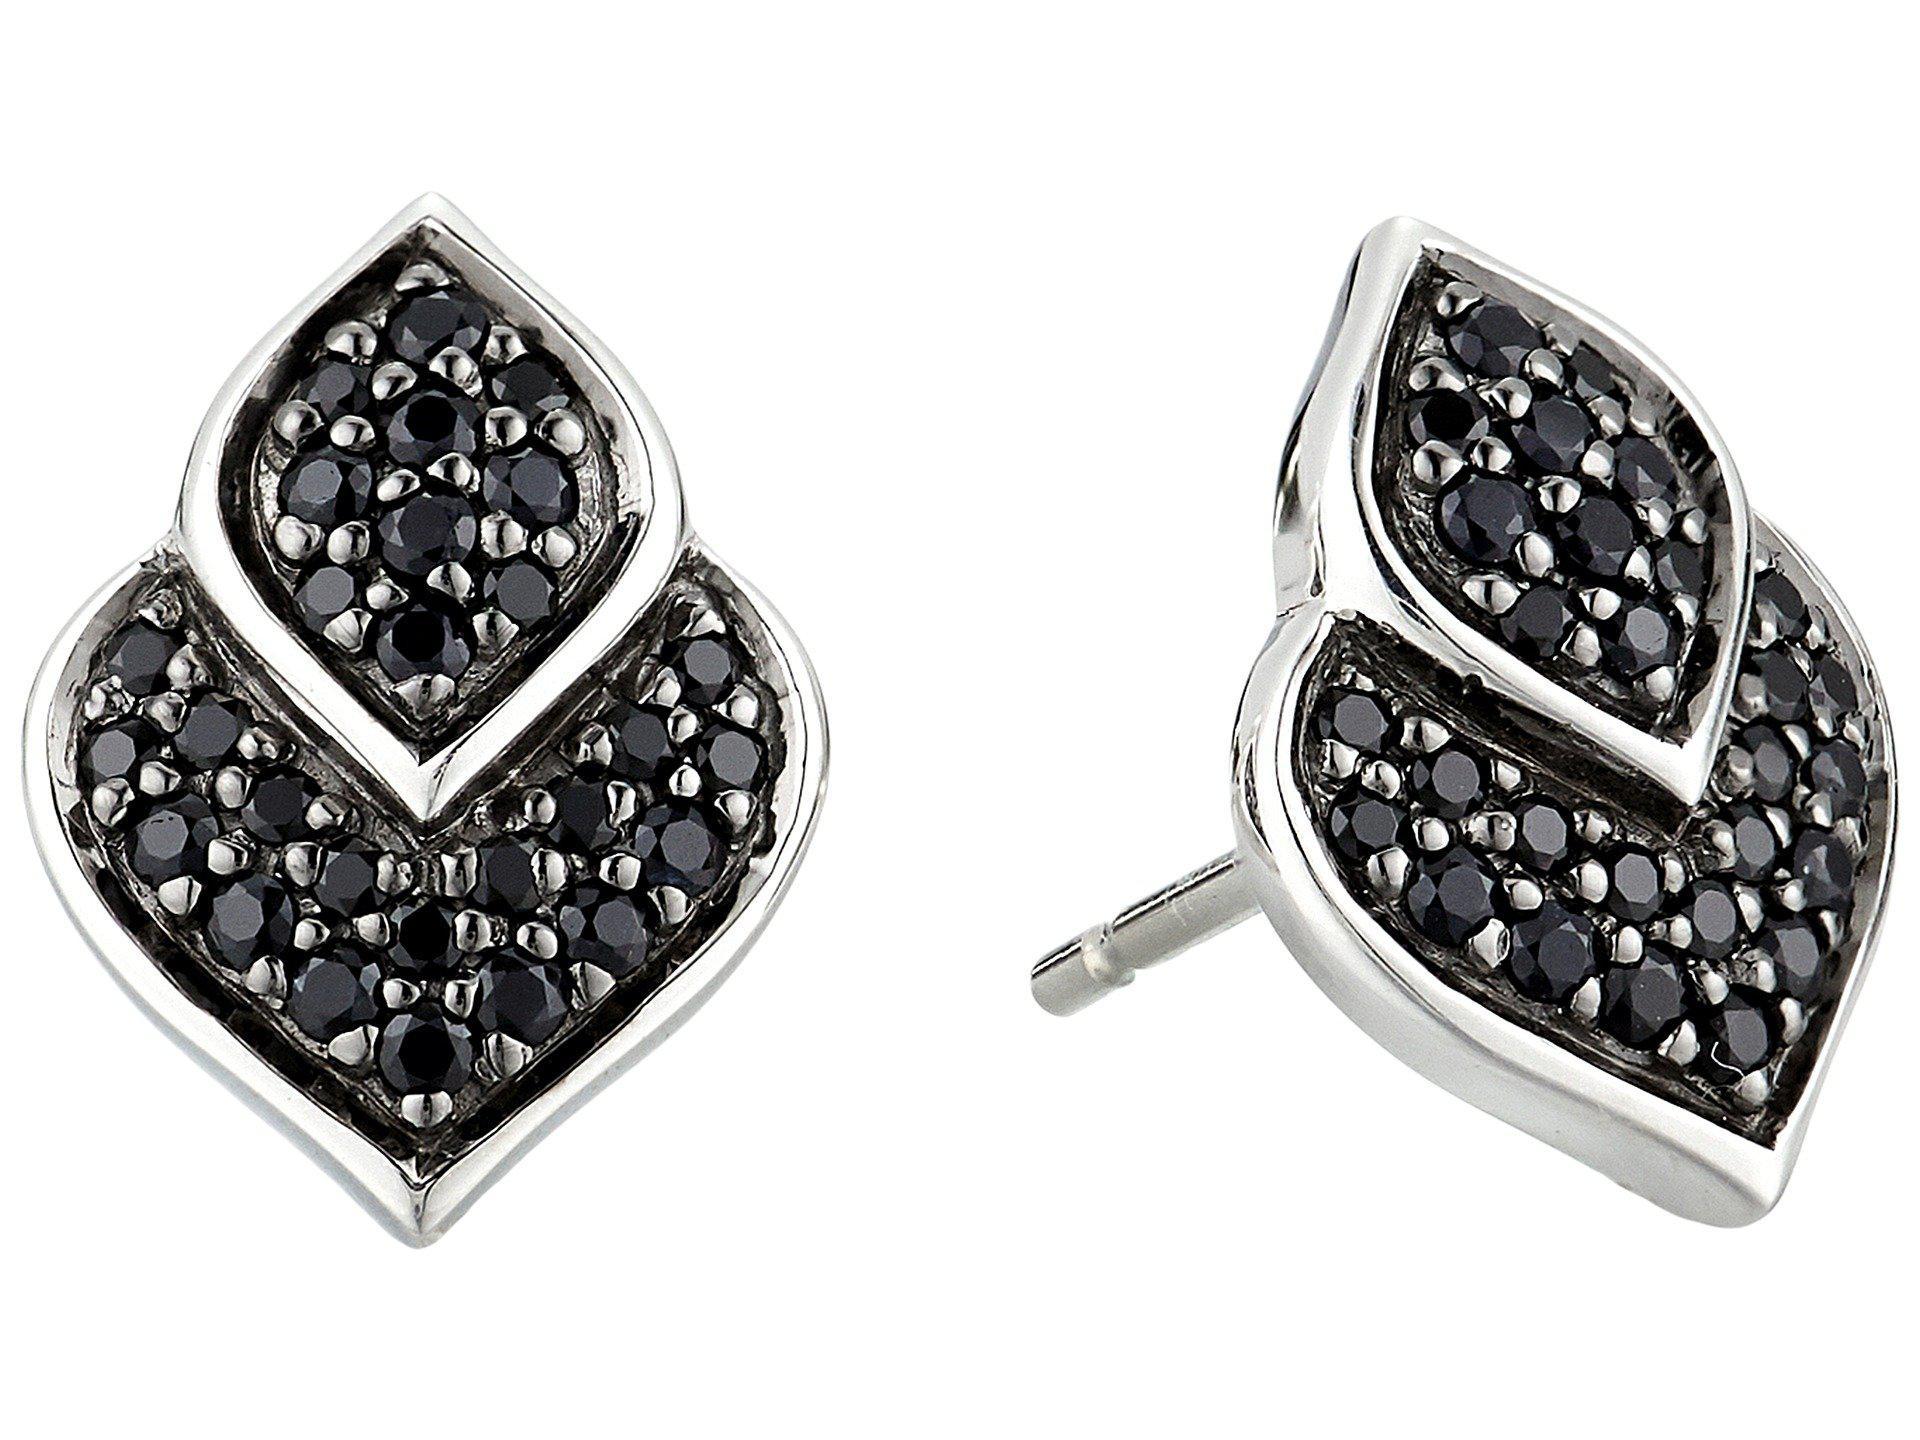 John Hardy Naga Stud Earring With Black Sapphire, Black Spinel Black spinel